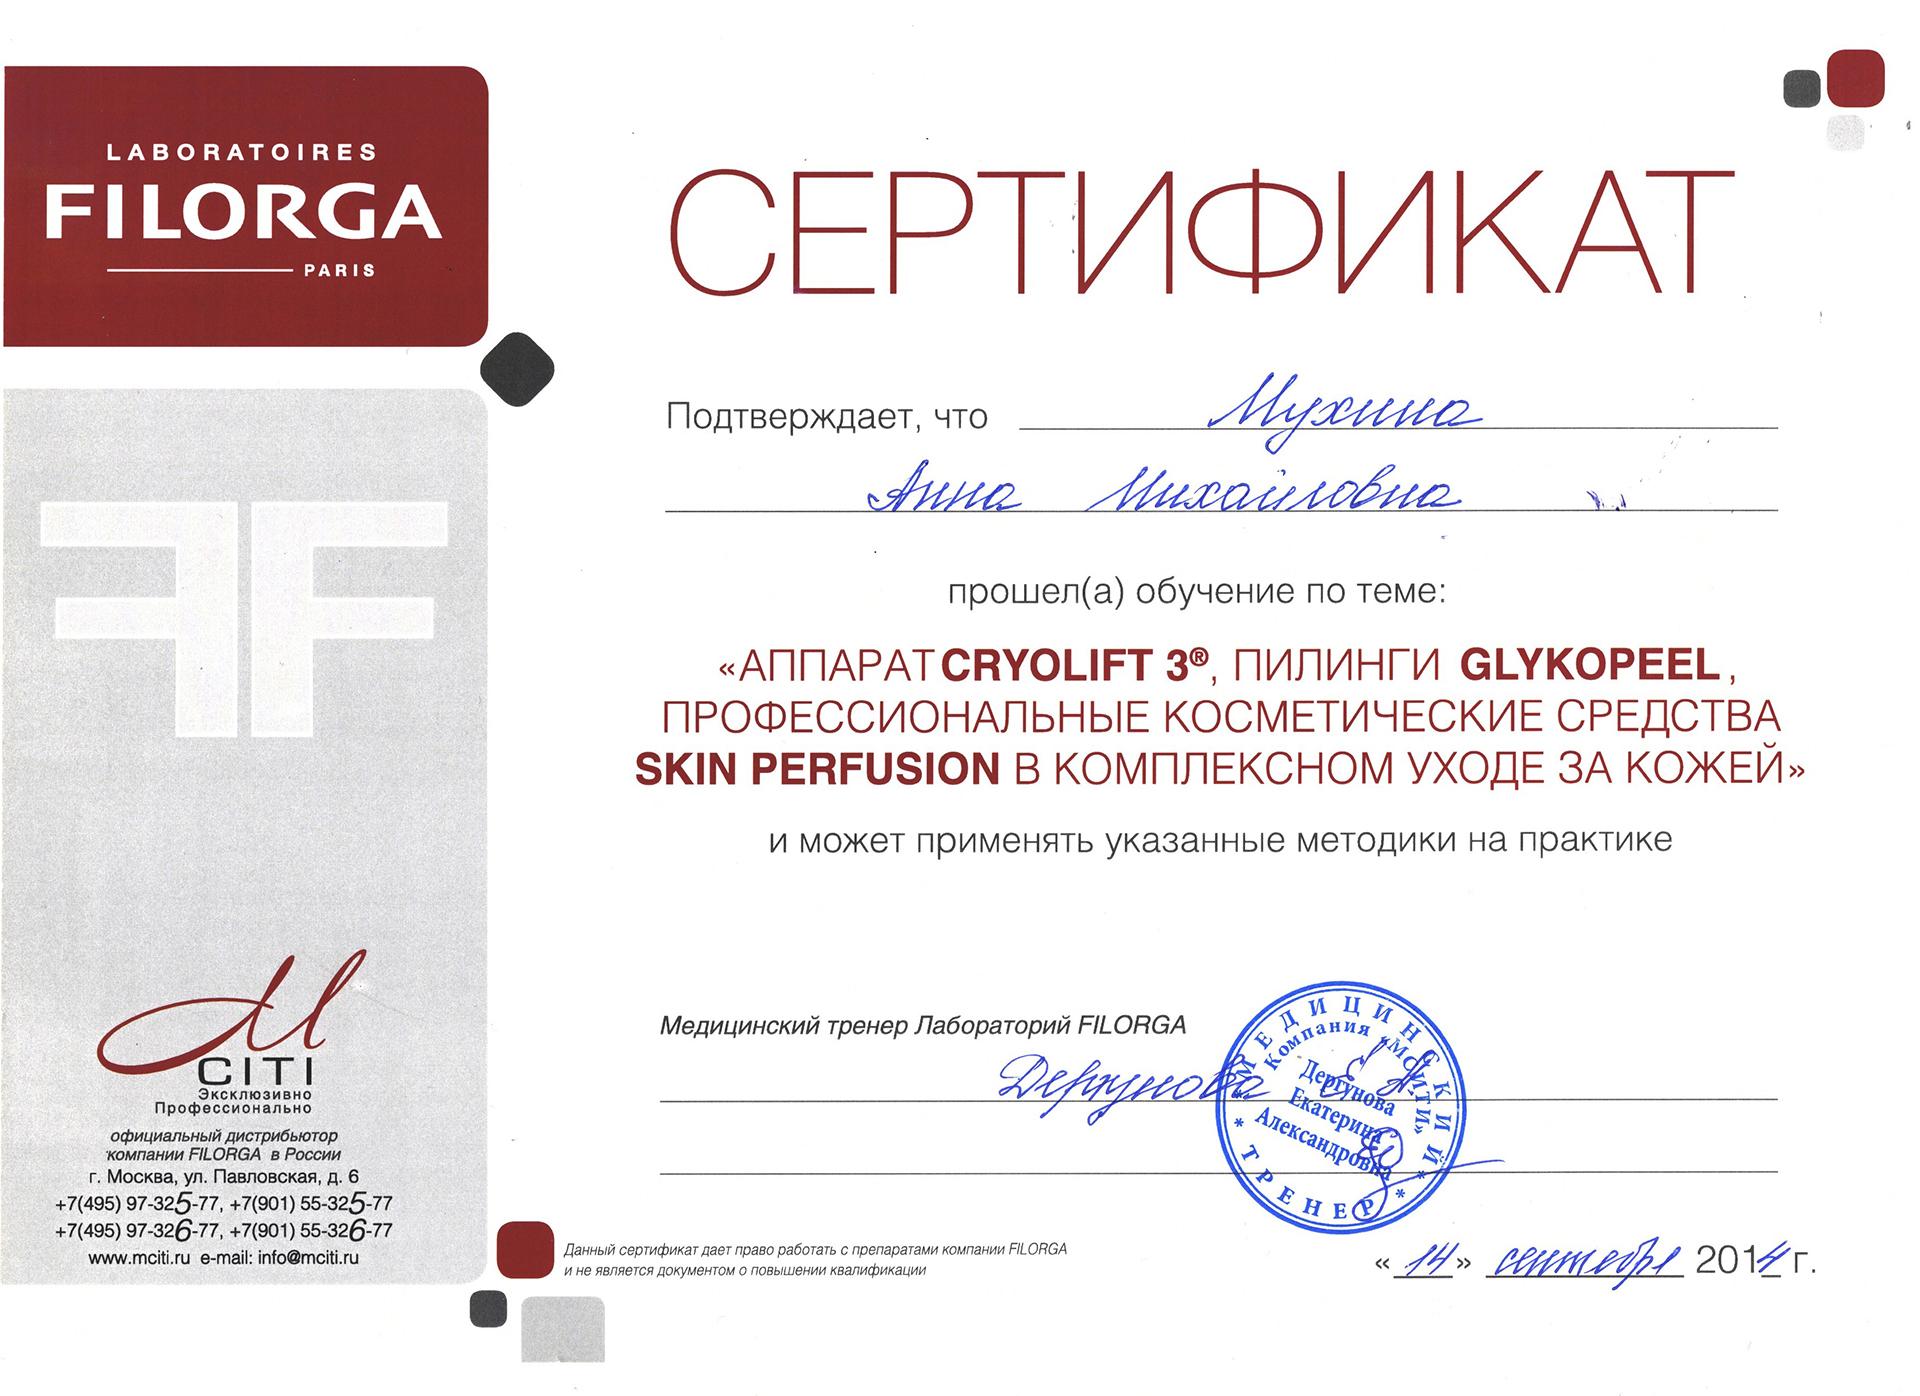 Сертификат — Обучение «Аппарат Cryolift 3, пилинги Glykopeel». Мухина Анна Михайловна